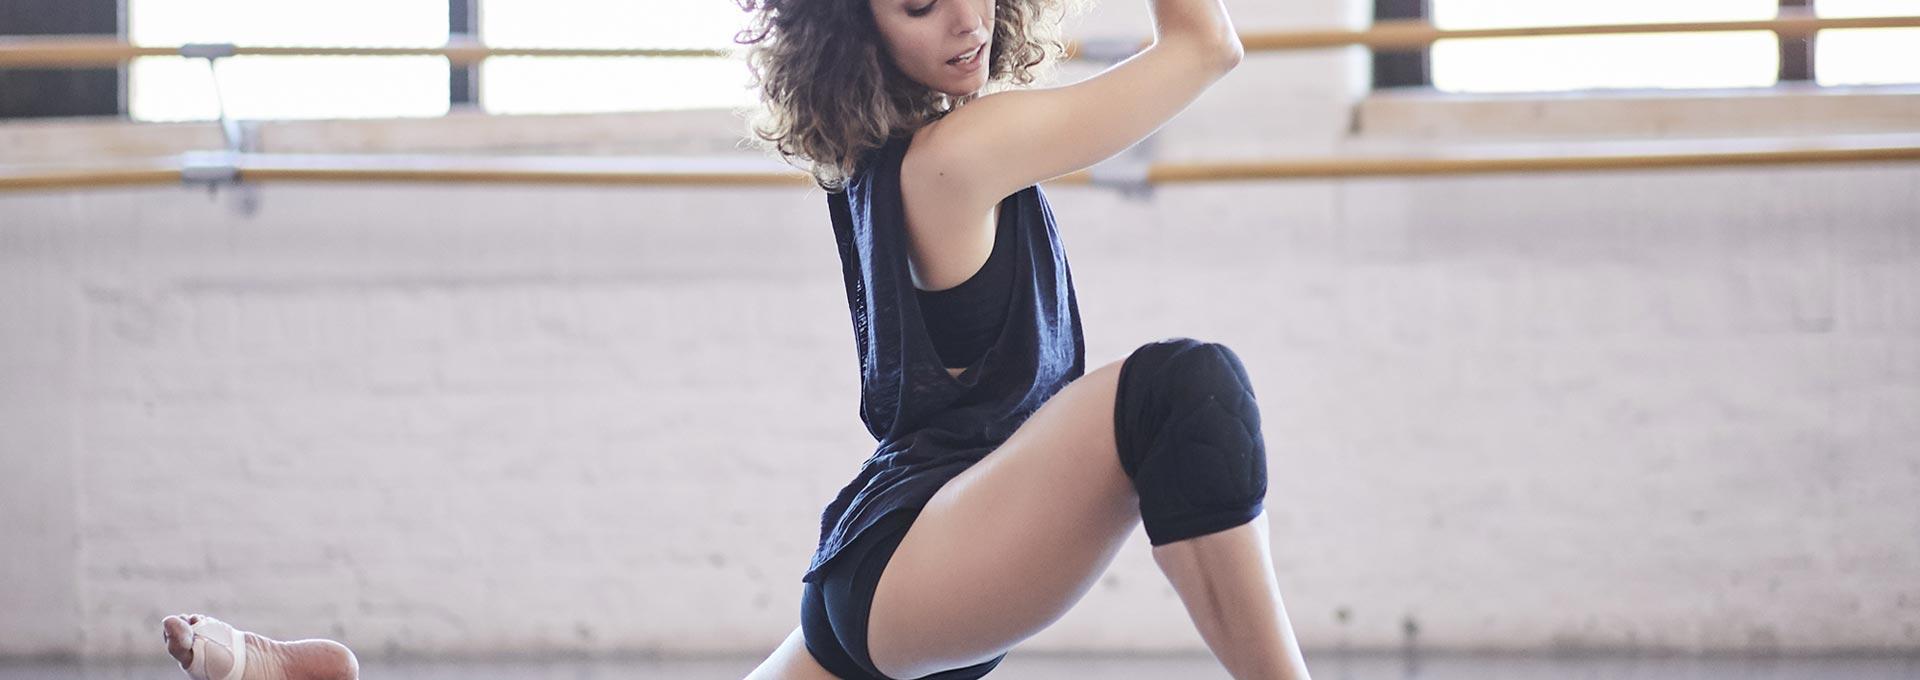 Genouillere danse decathlon protection genou